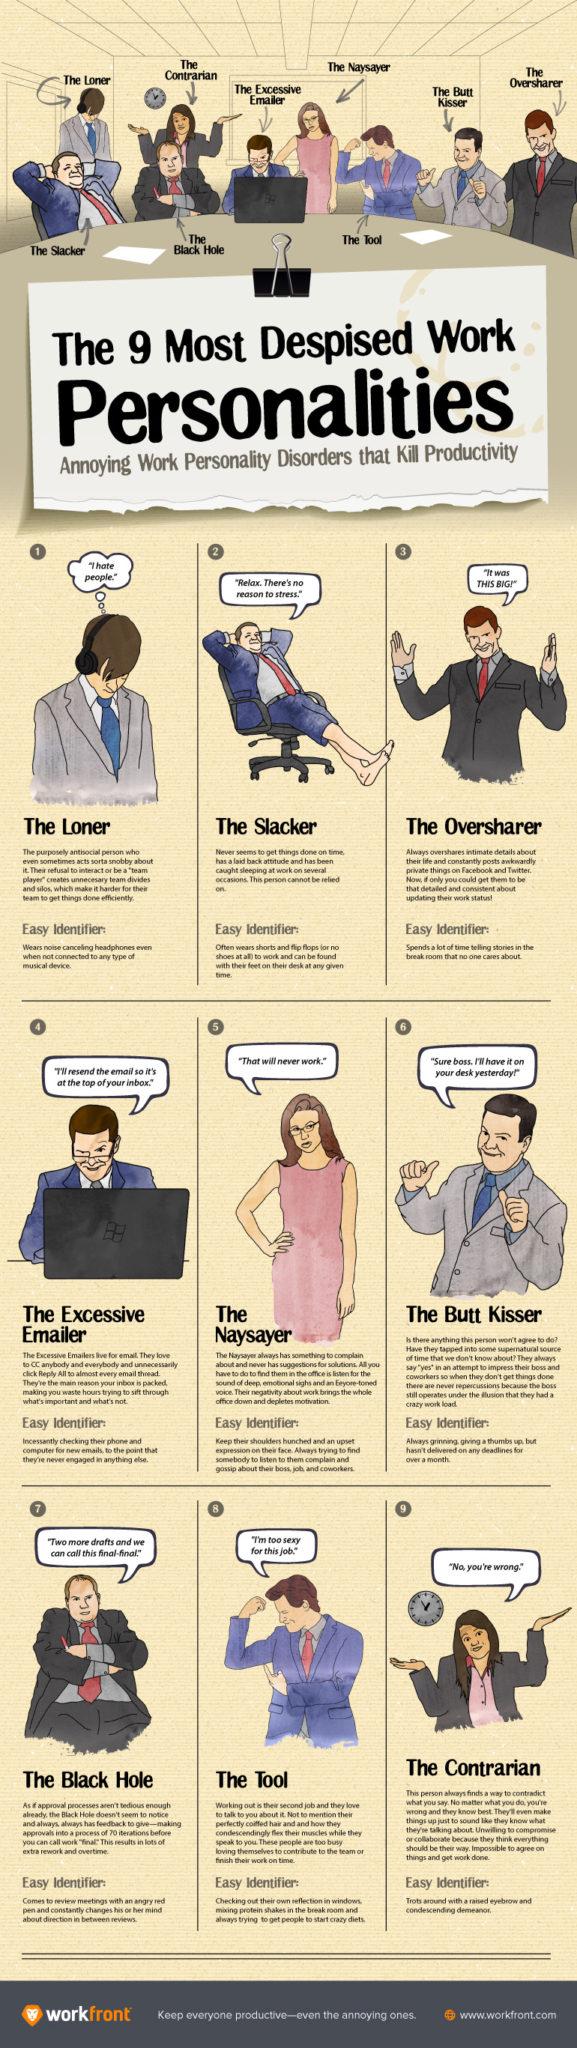 9 Most Despised Work Personalities [Infographic]